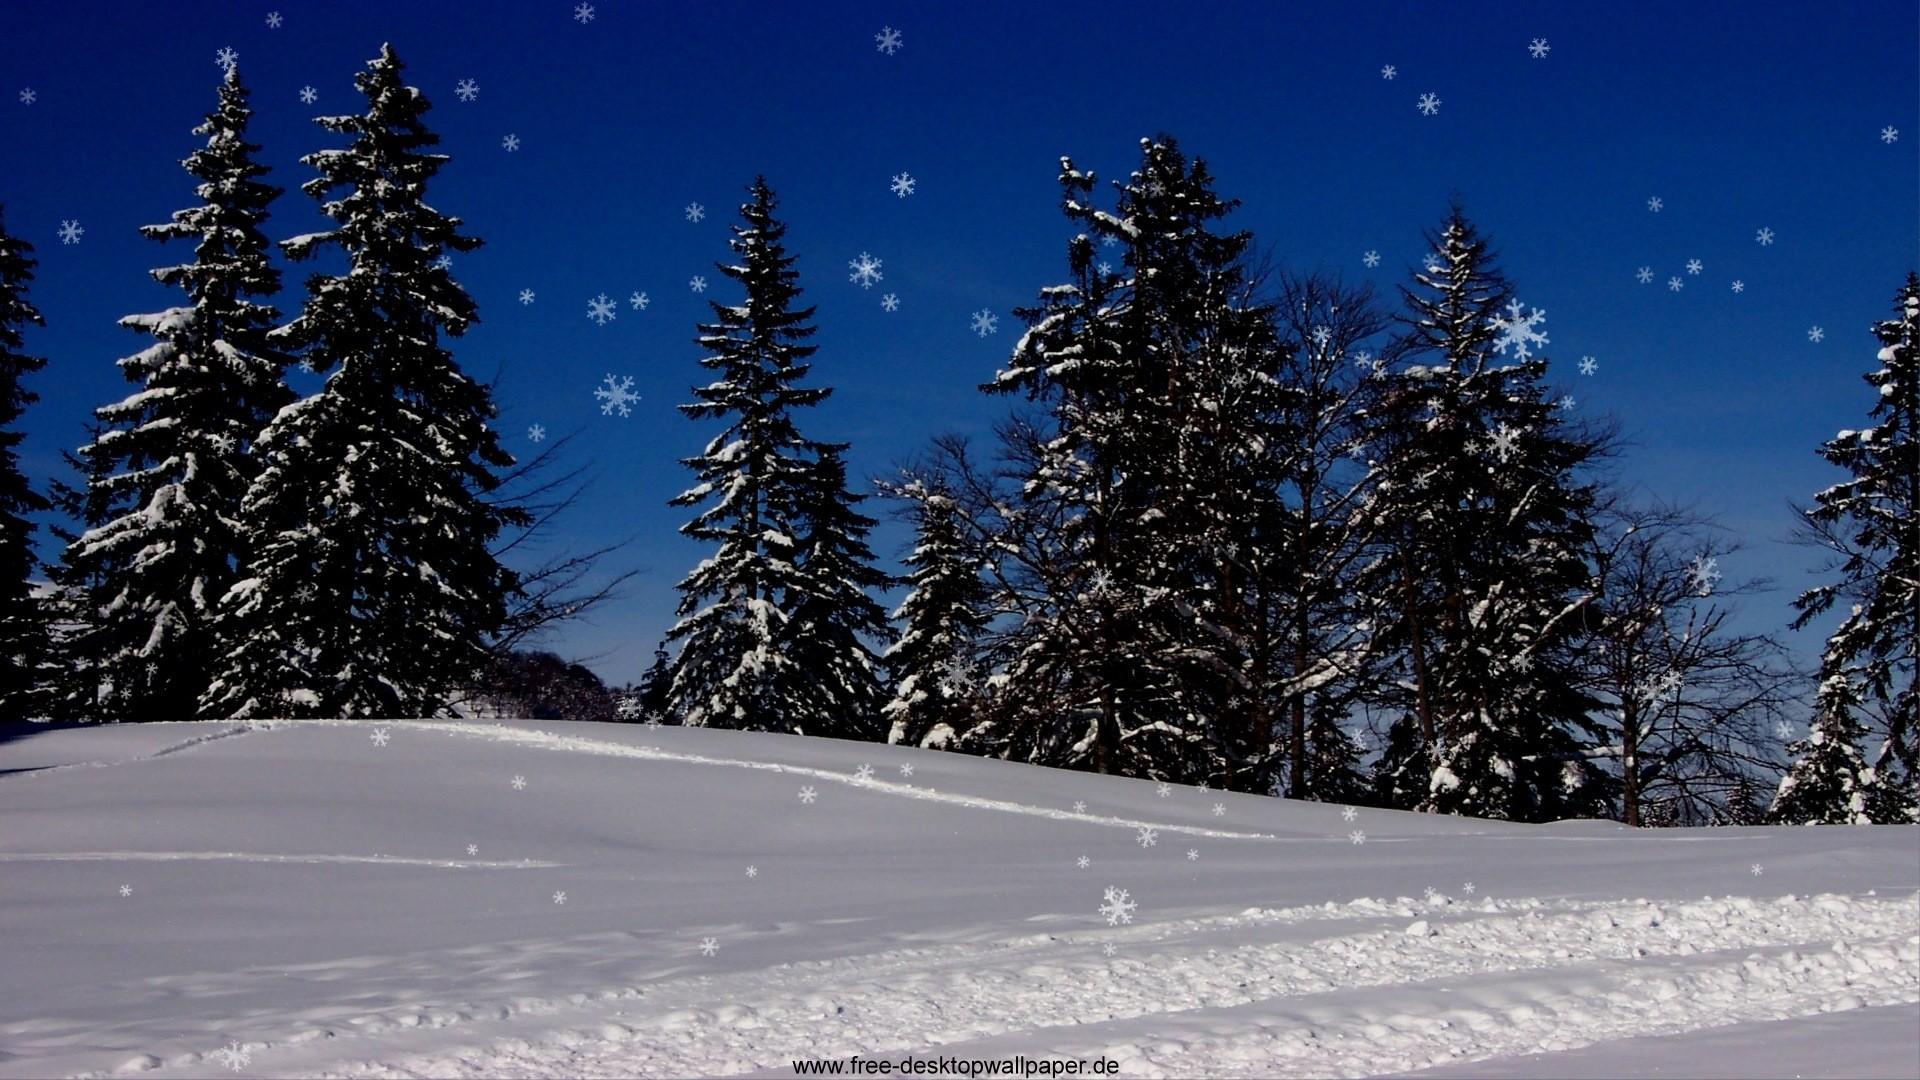 Free Snowy Christmas Desktop Wallpapers – www.wallpapers-in-hd.com